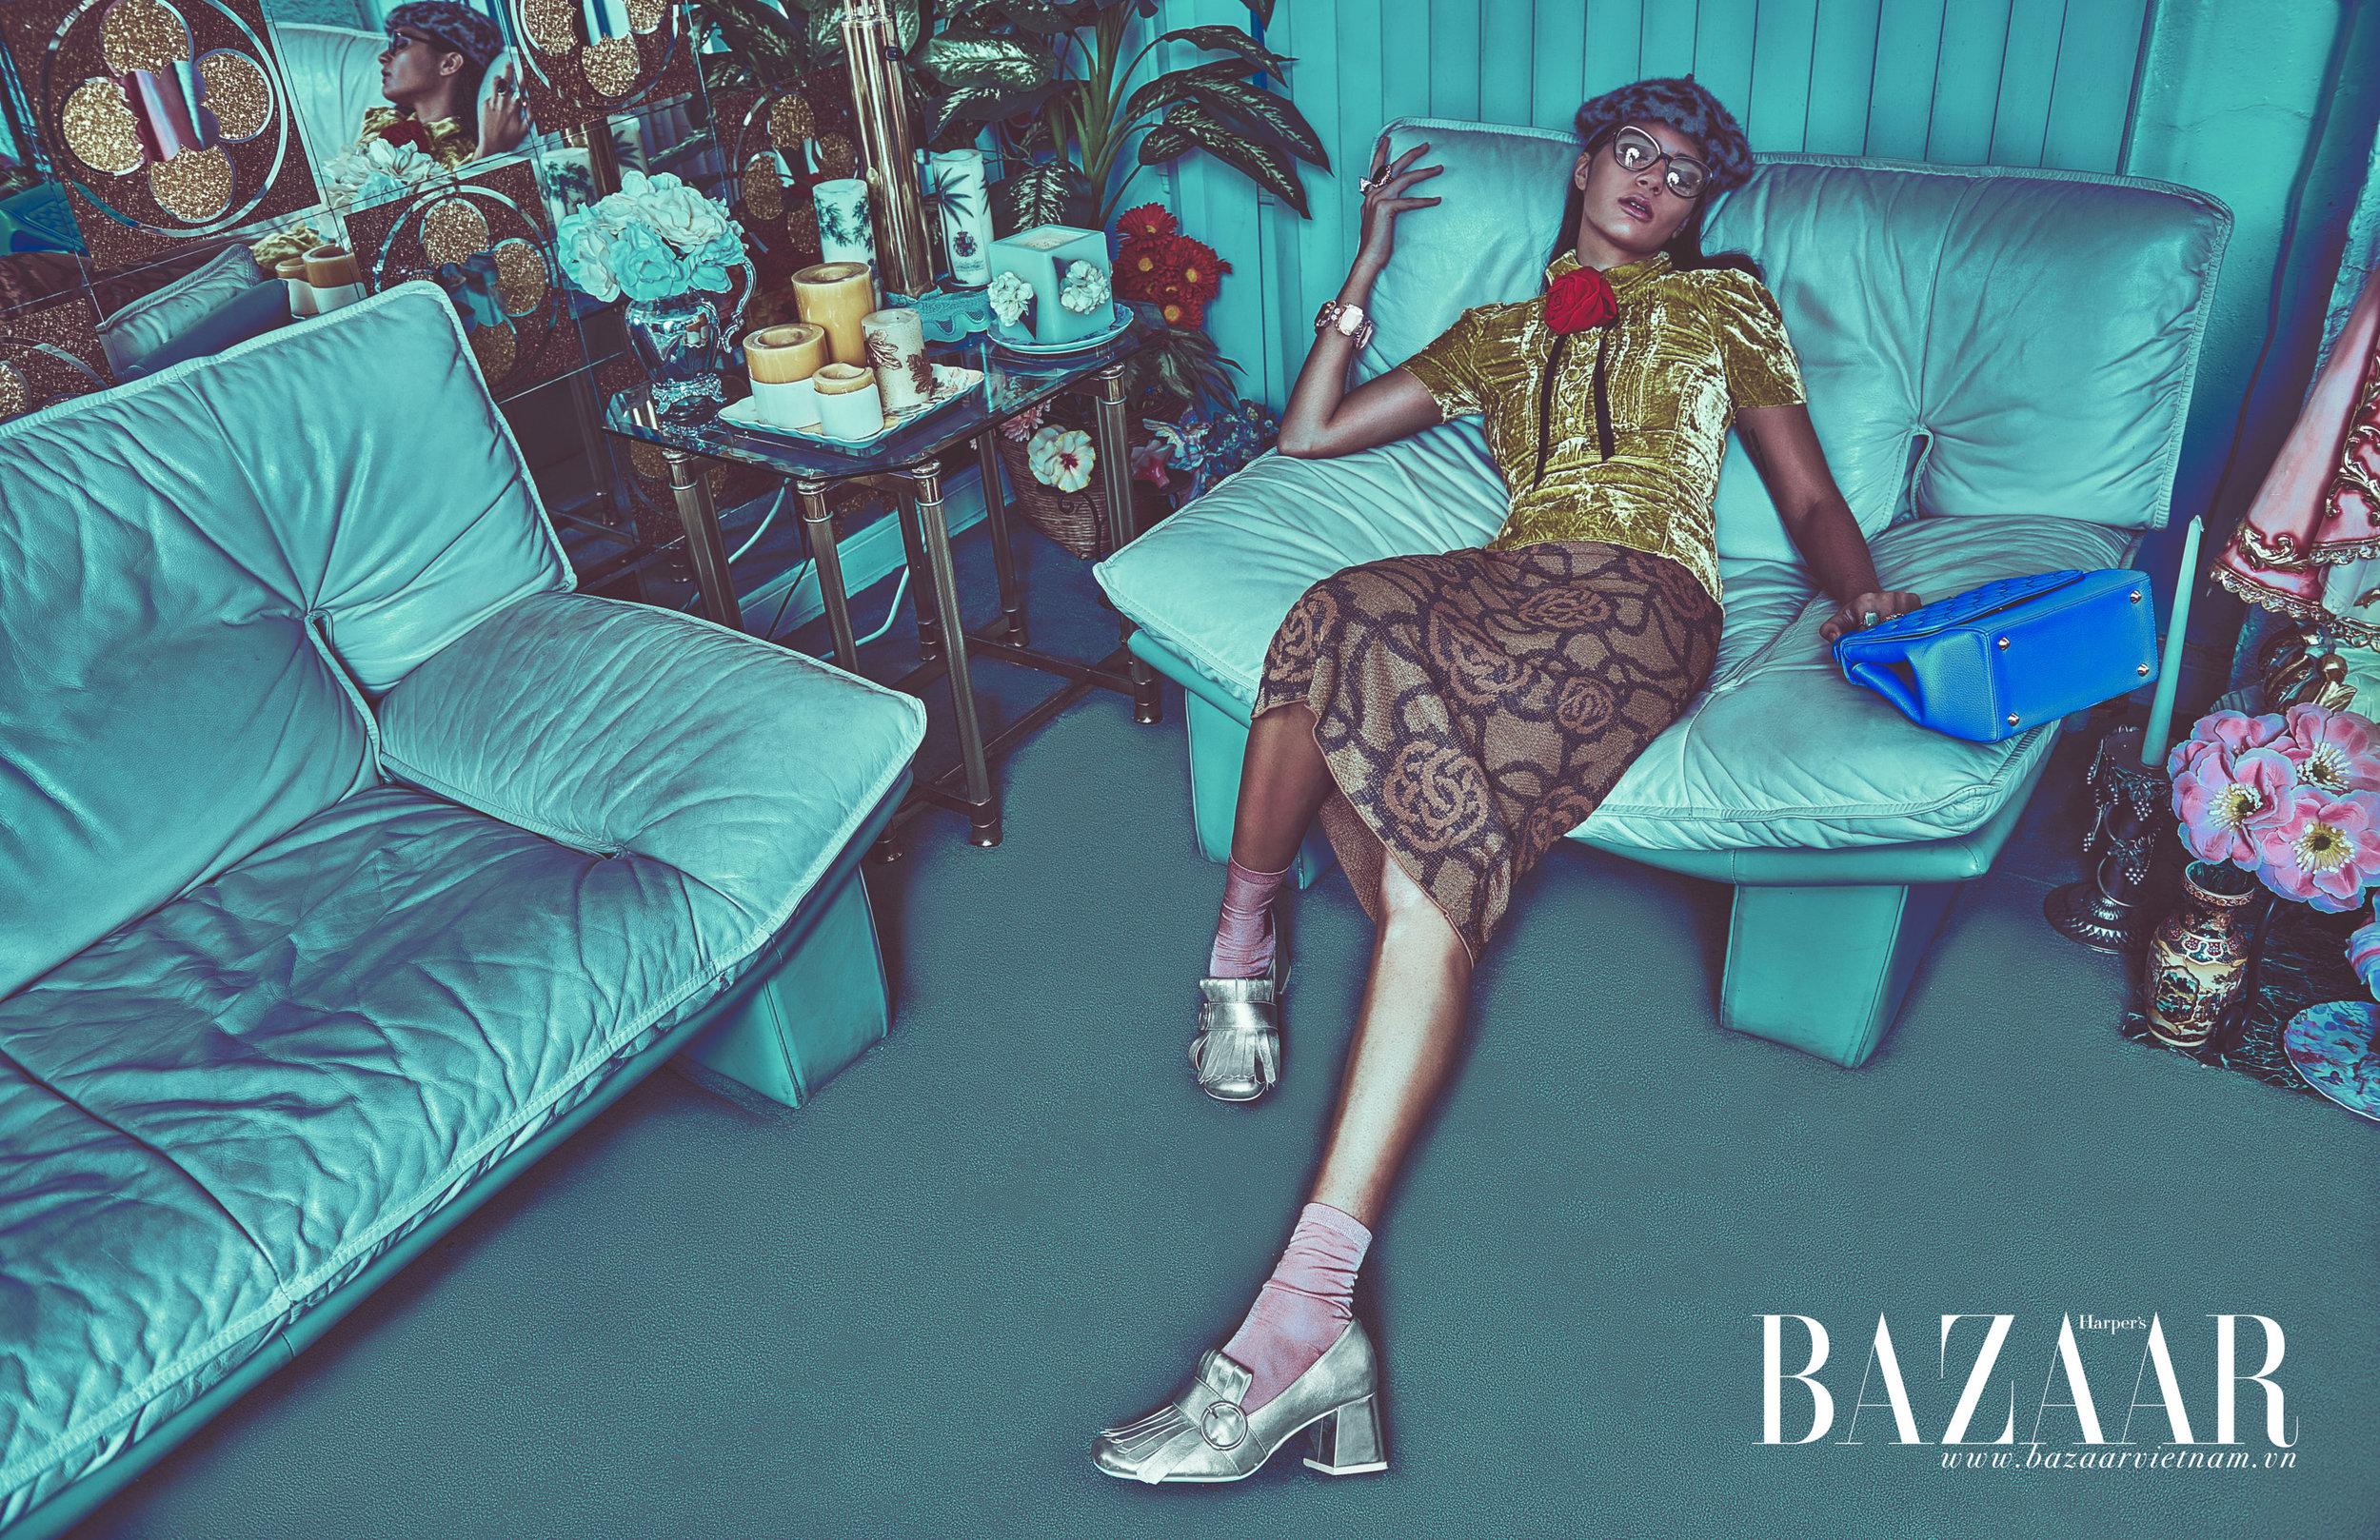 Harper's Bazaar x GUCCI SS16 - Advertorial